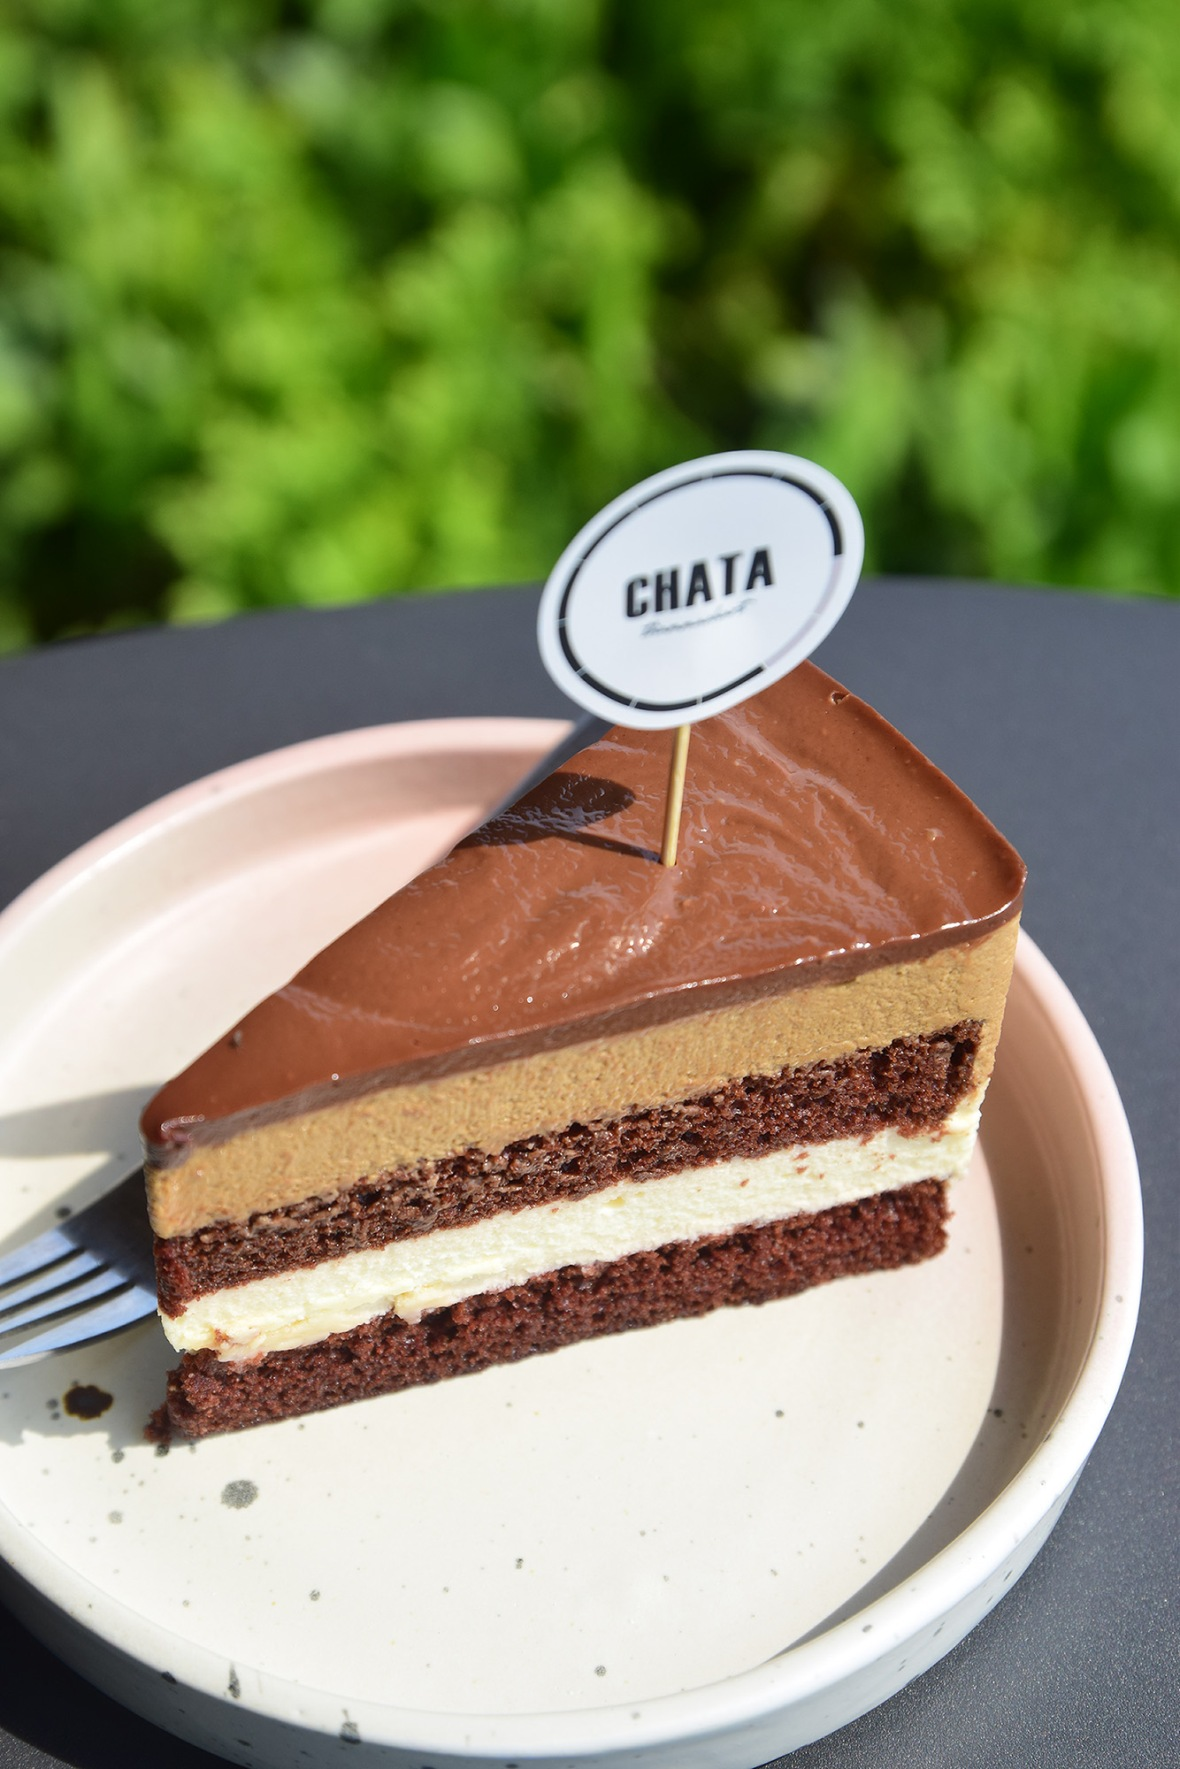 Chata thammachart Cafe&Bistro (42)